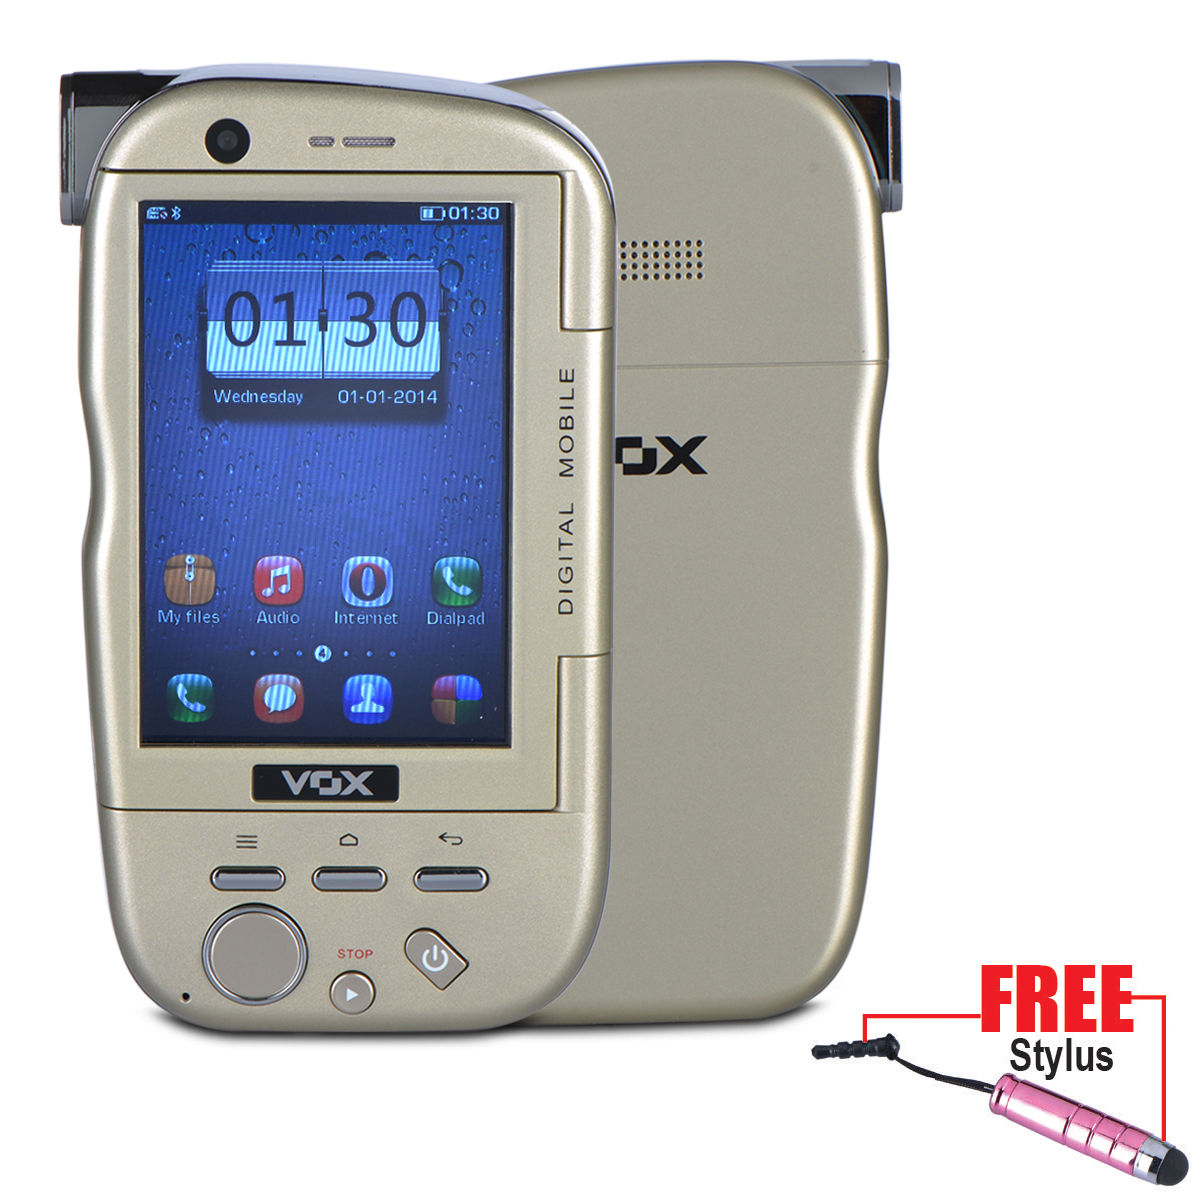 Vox Mobil